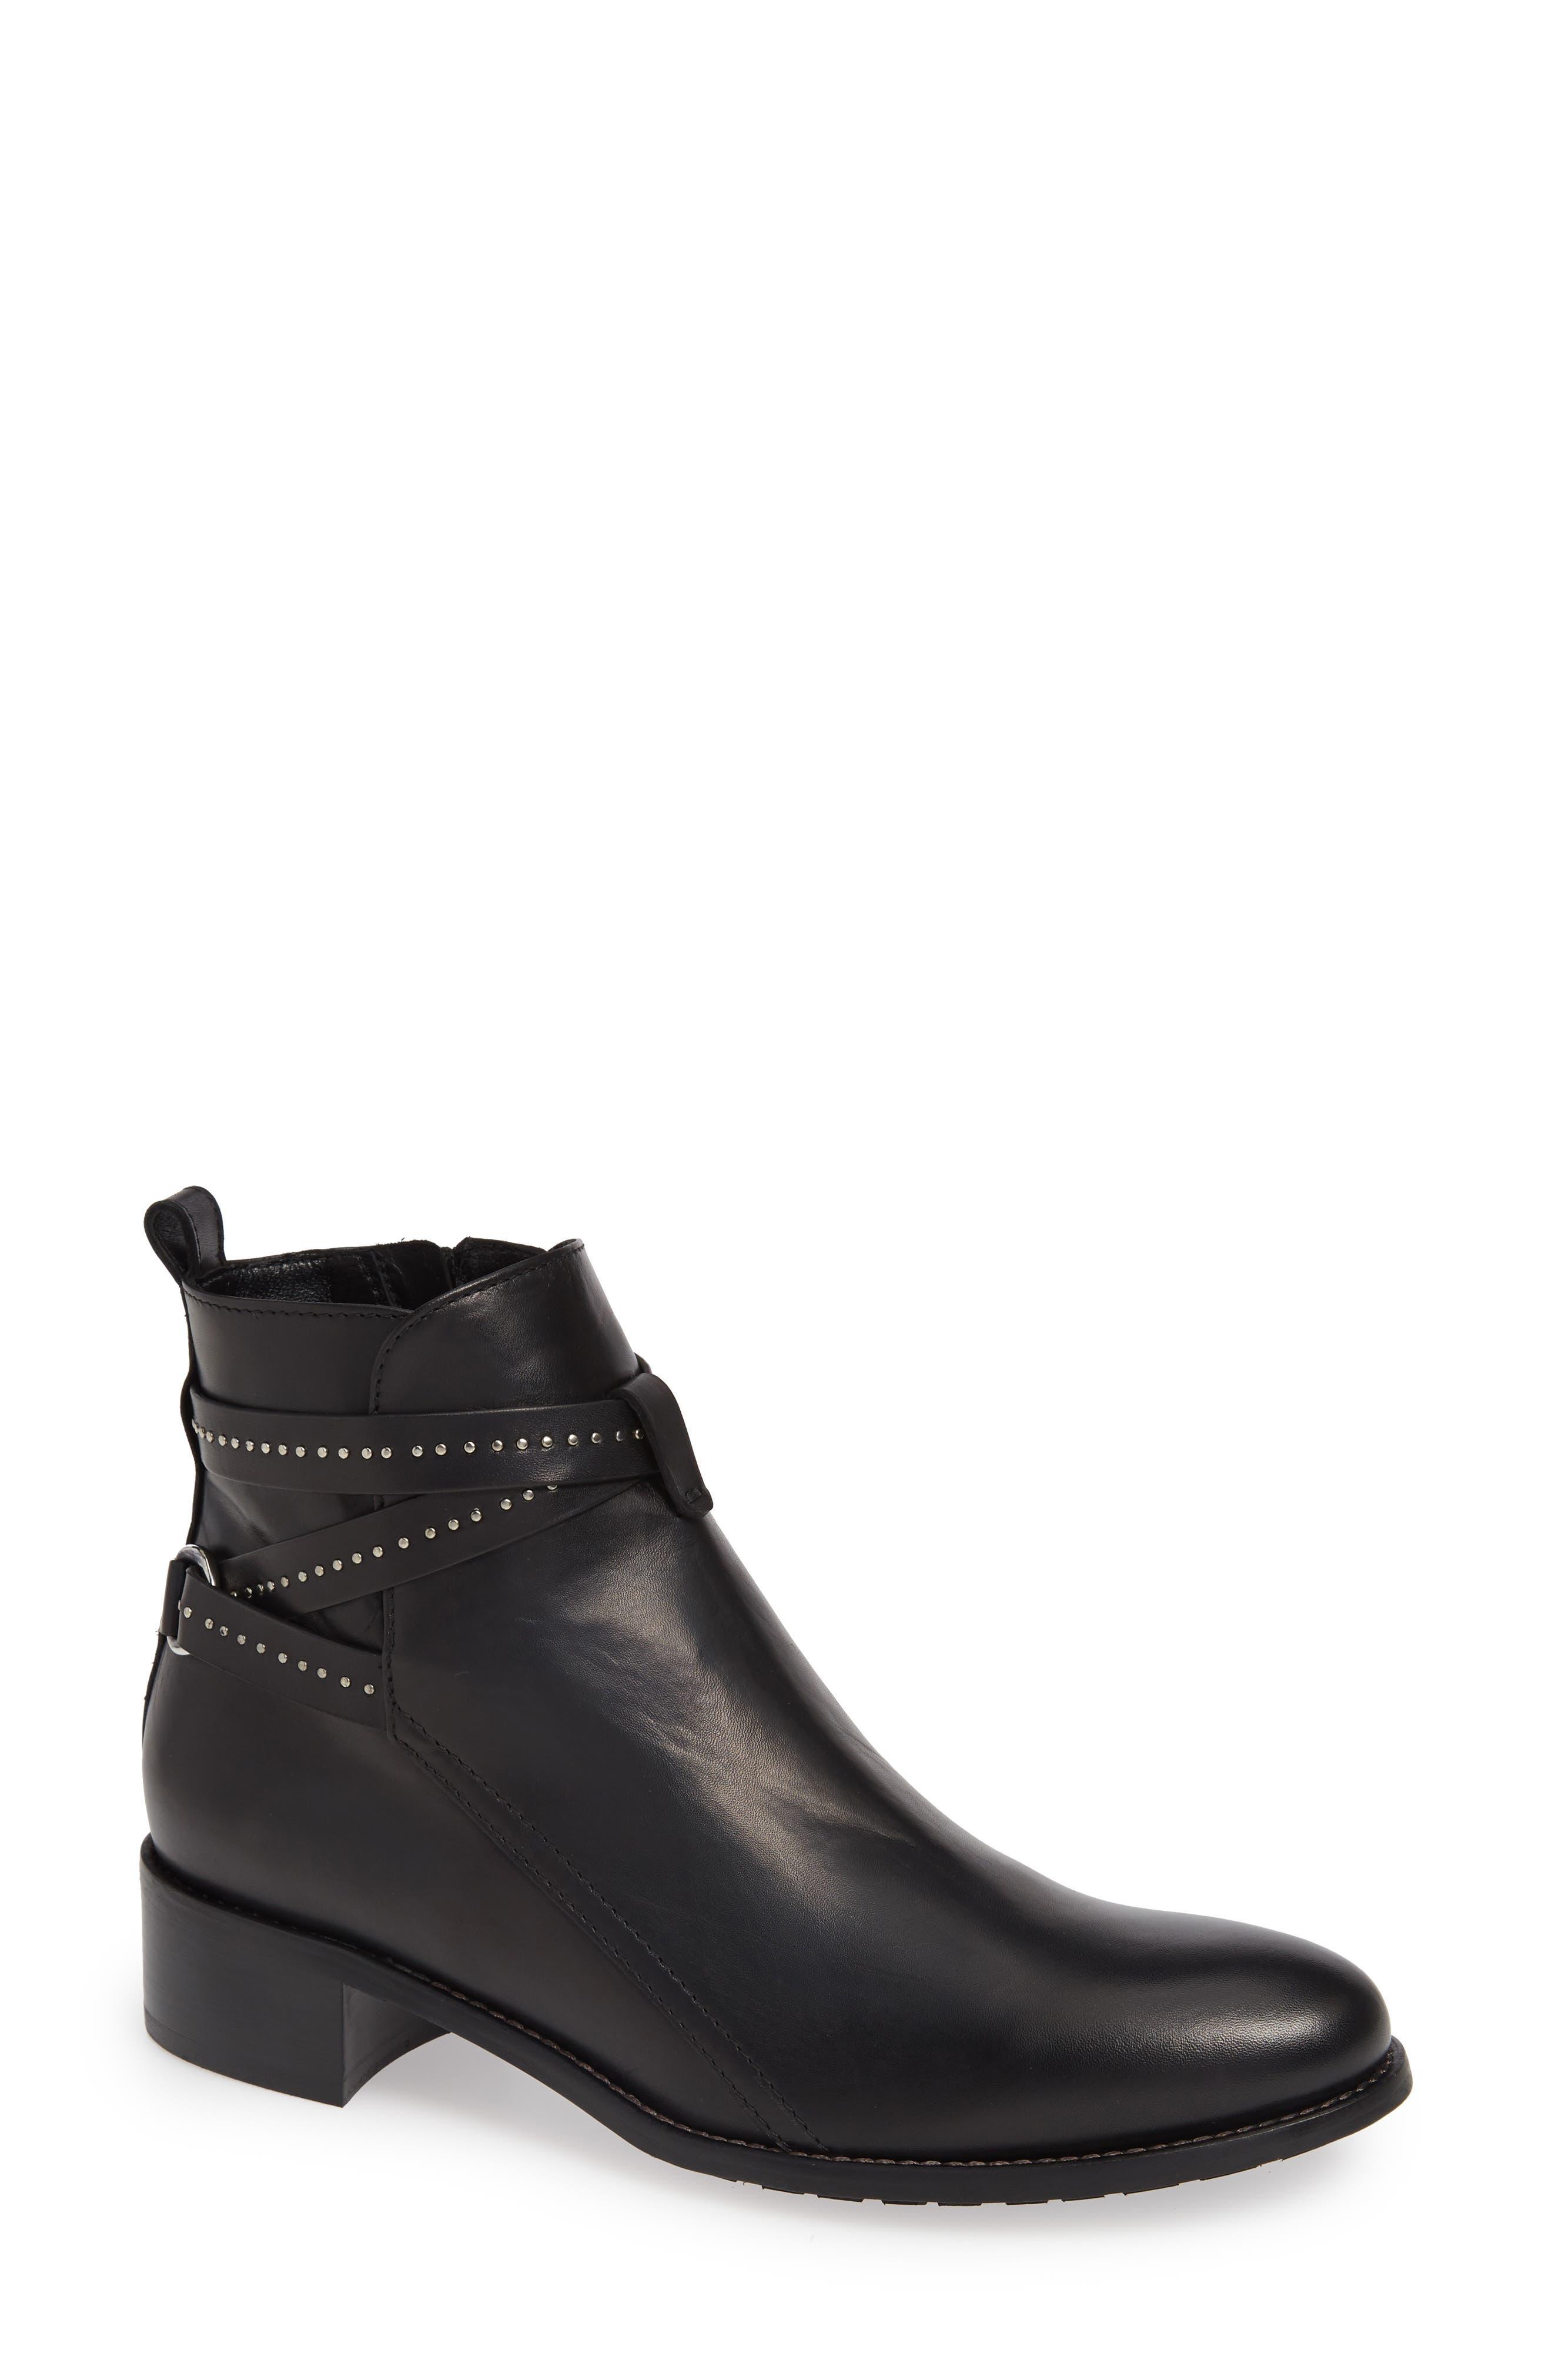 Aquatalia Odema Weatherproof Boot- Black